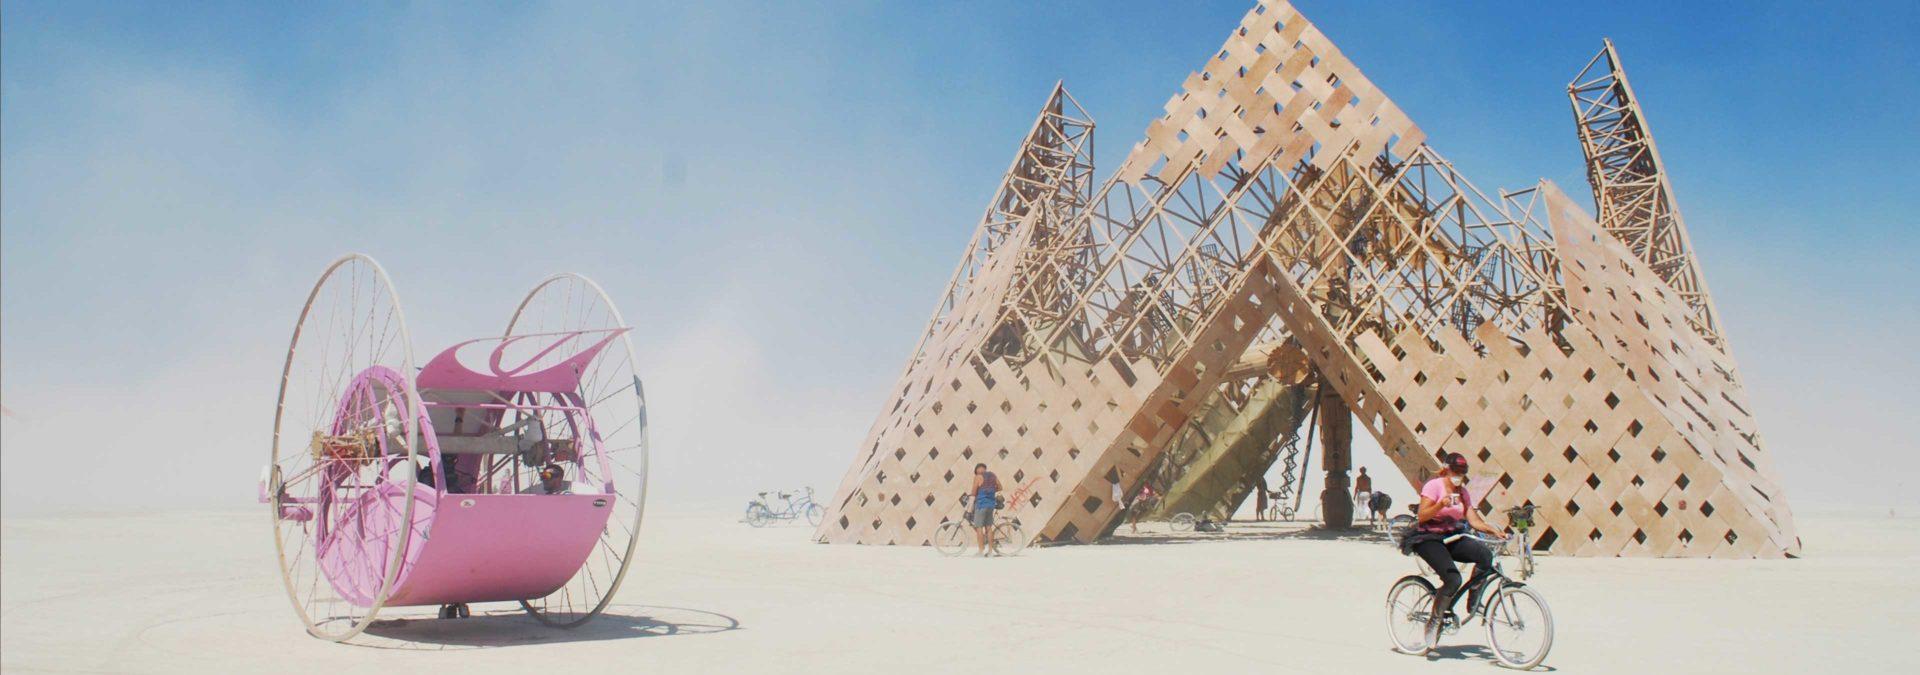 Burning Man Festival Burning Man Tickets Visit Reno Tahoe